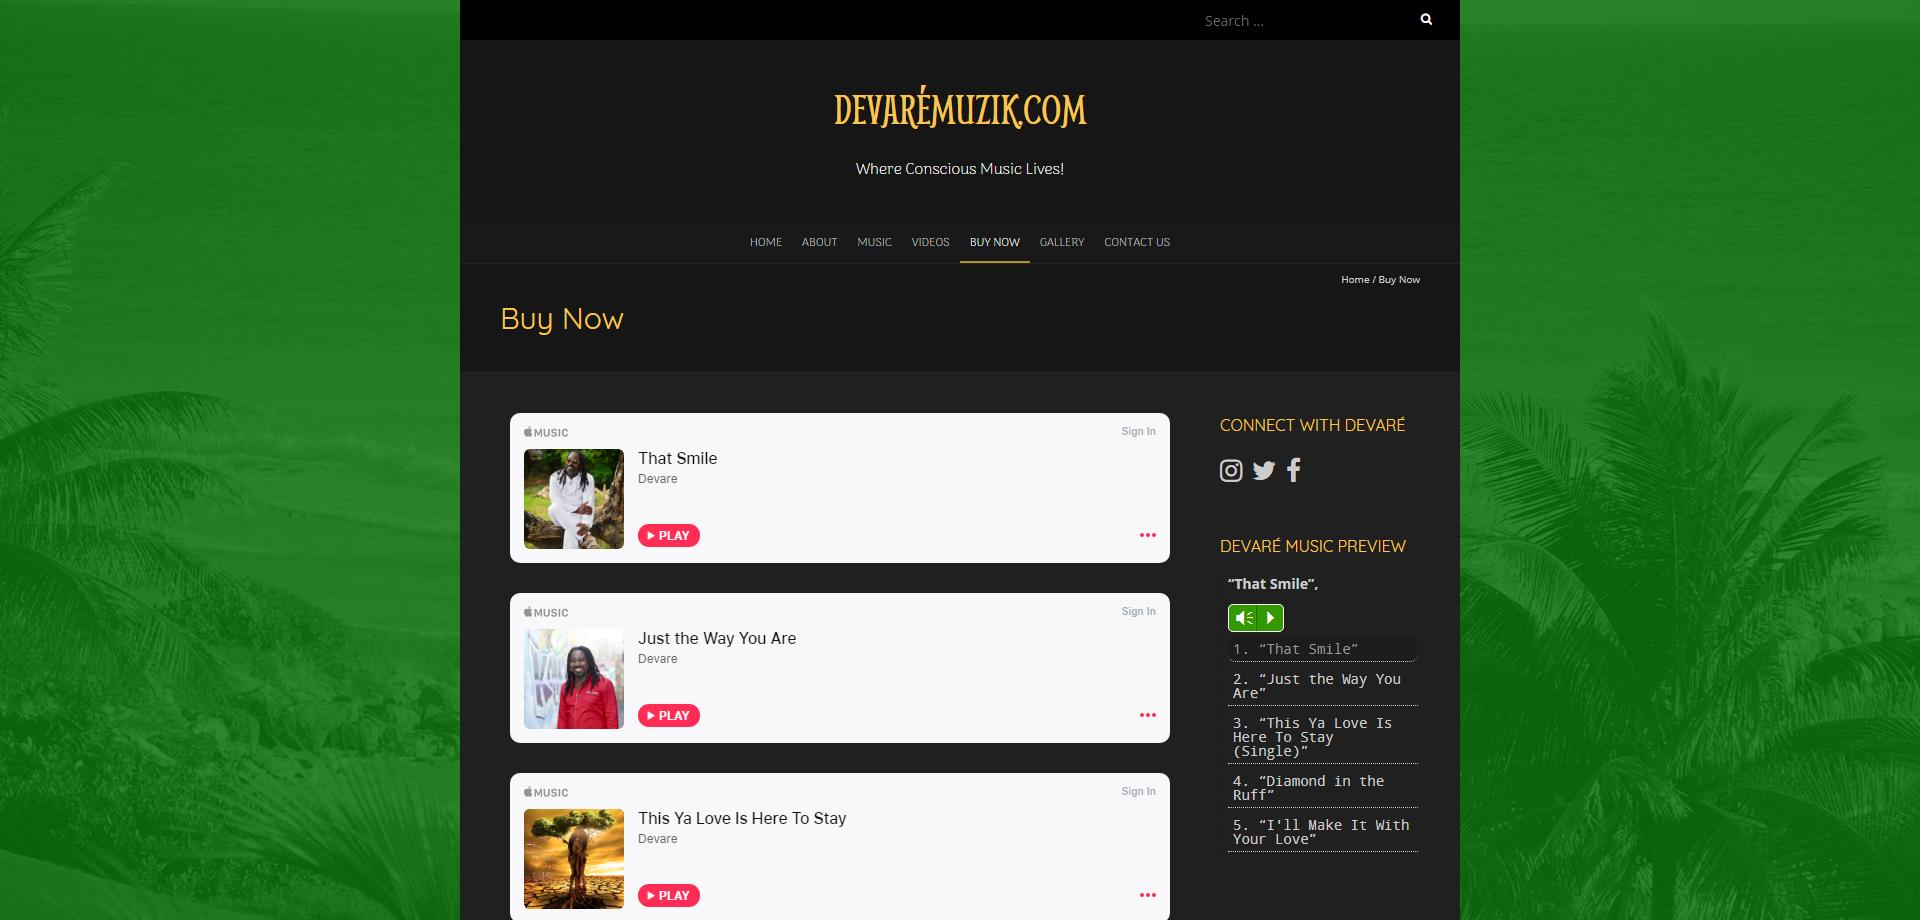 DevareMuzik Buy Music Web page